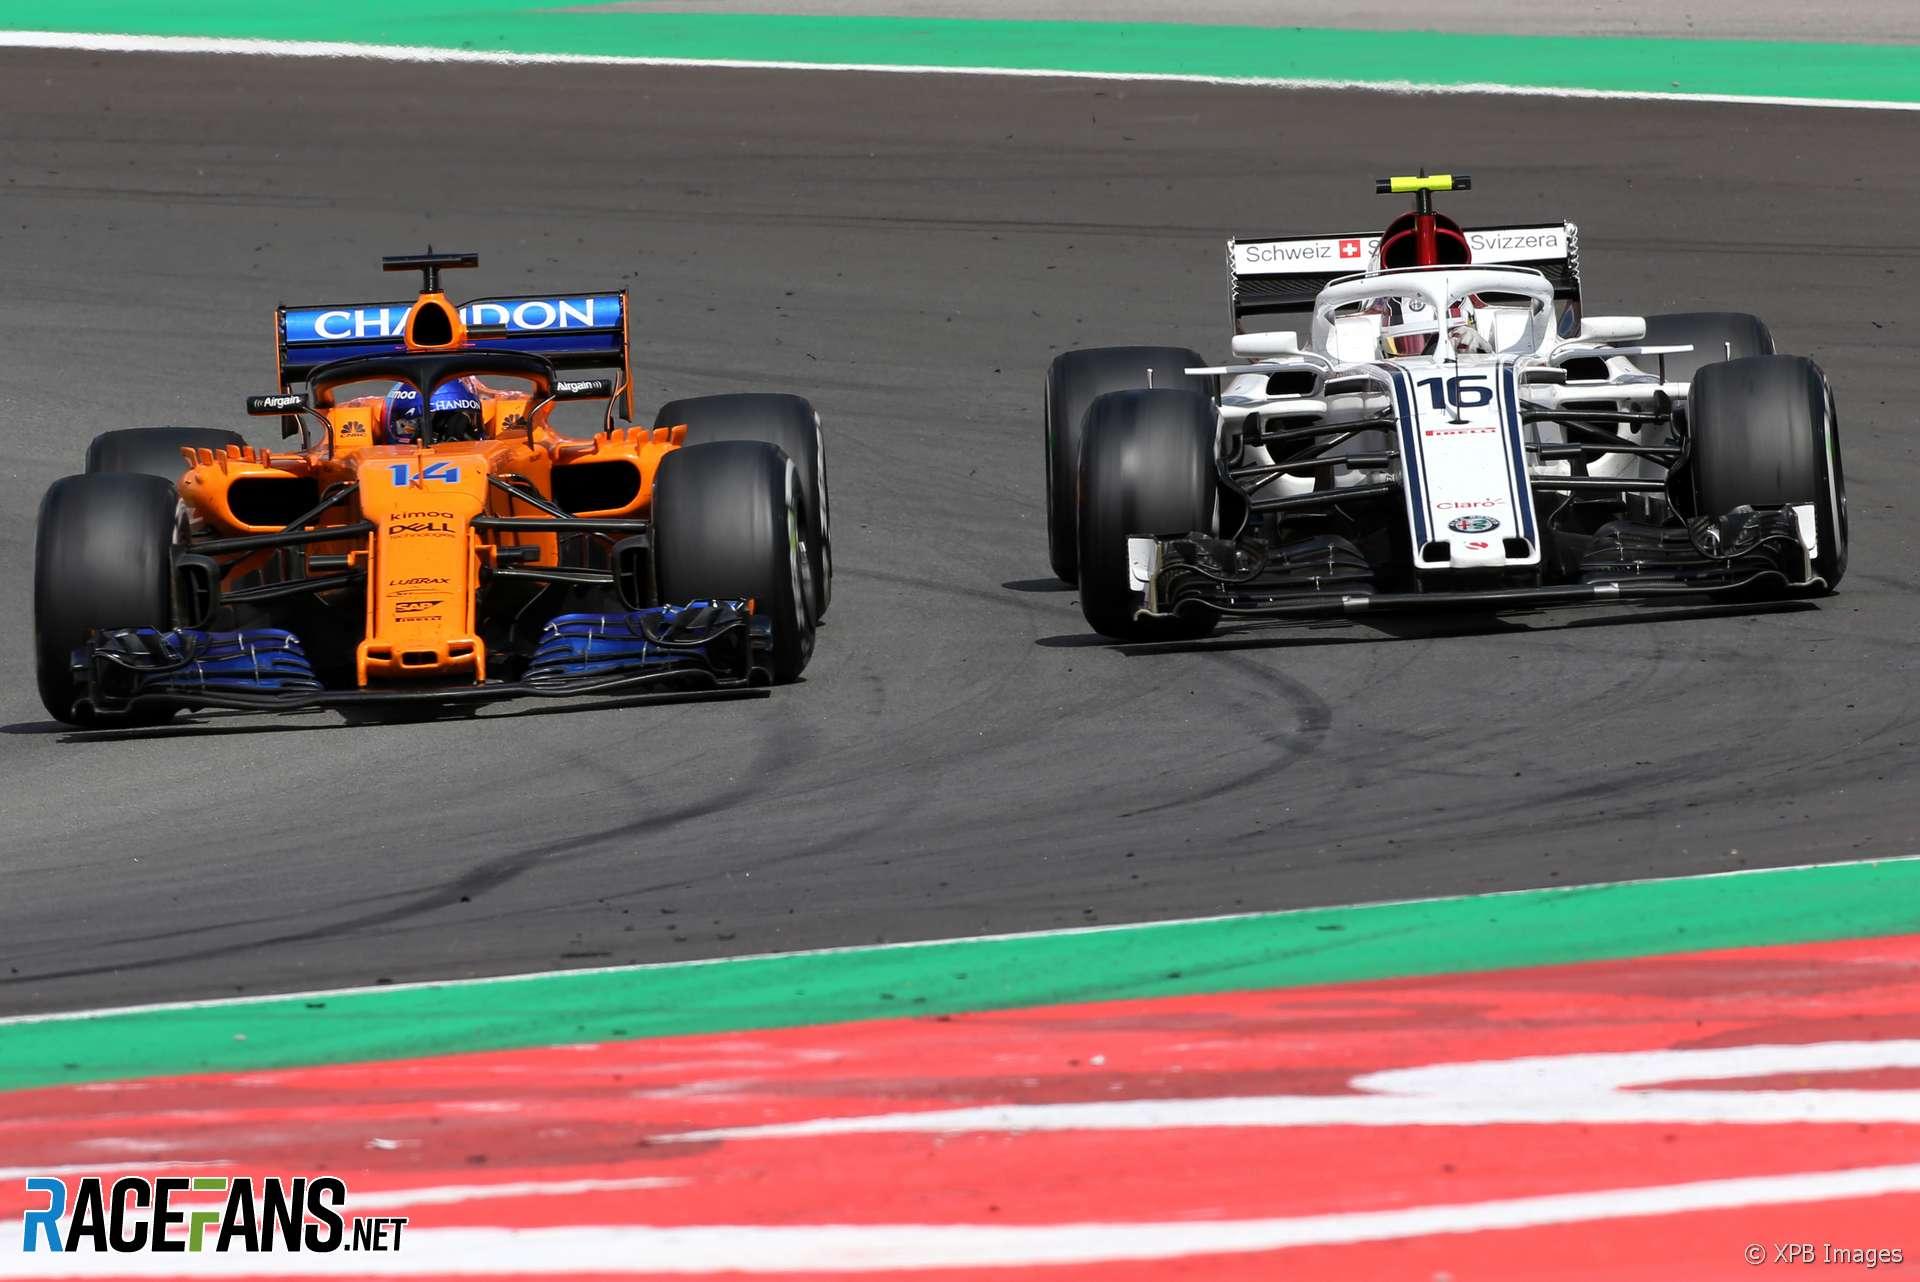 Fernando Alonso, Charles Leclerc, Circuit de Catalunya, 2018